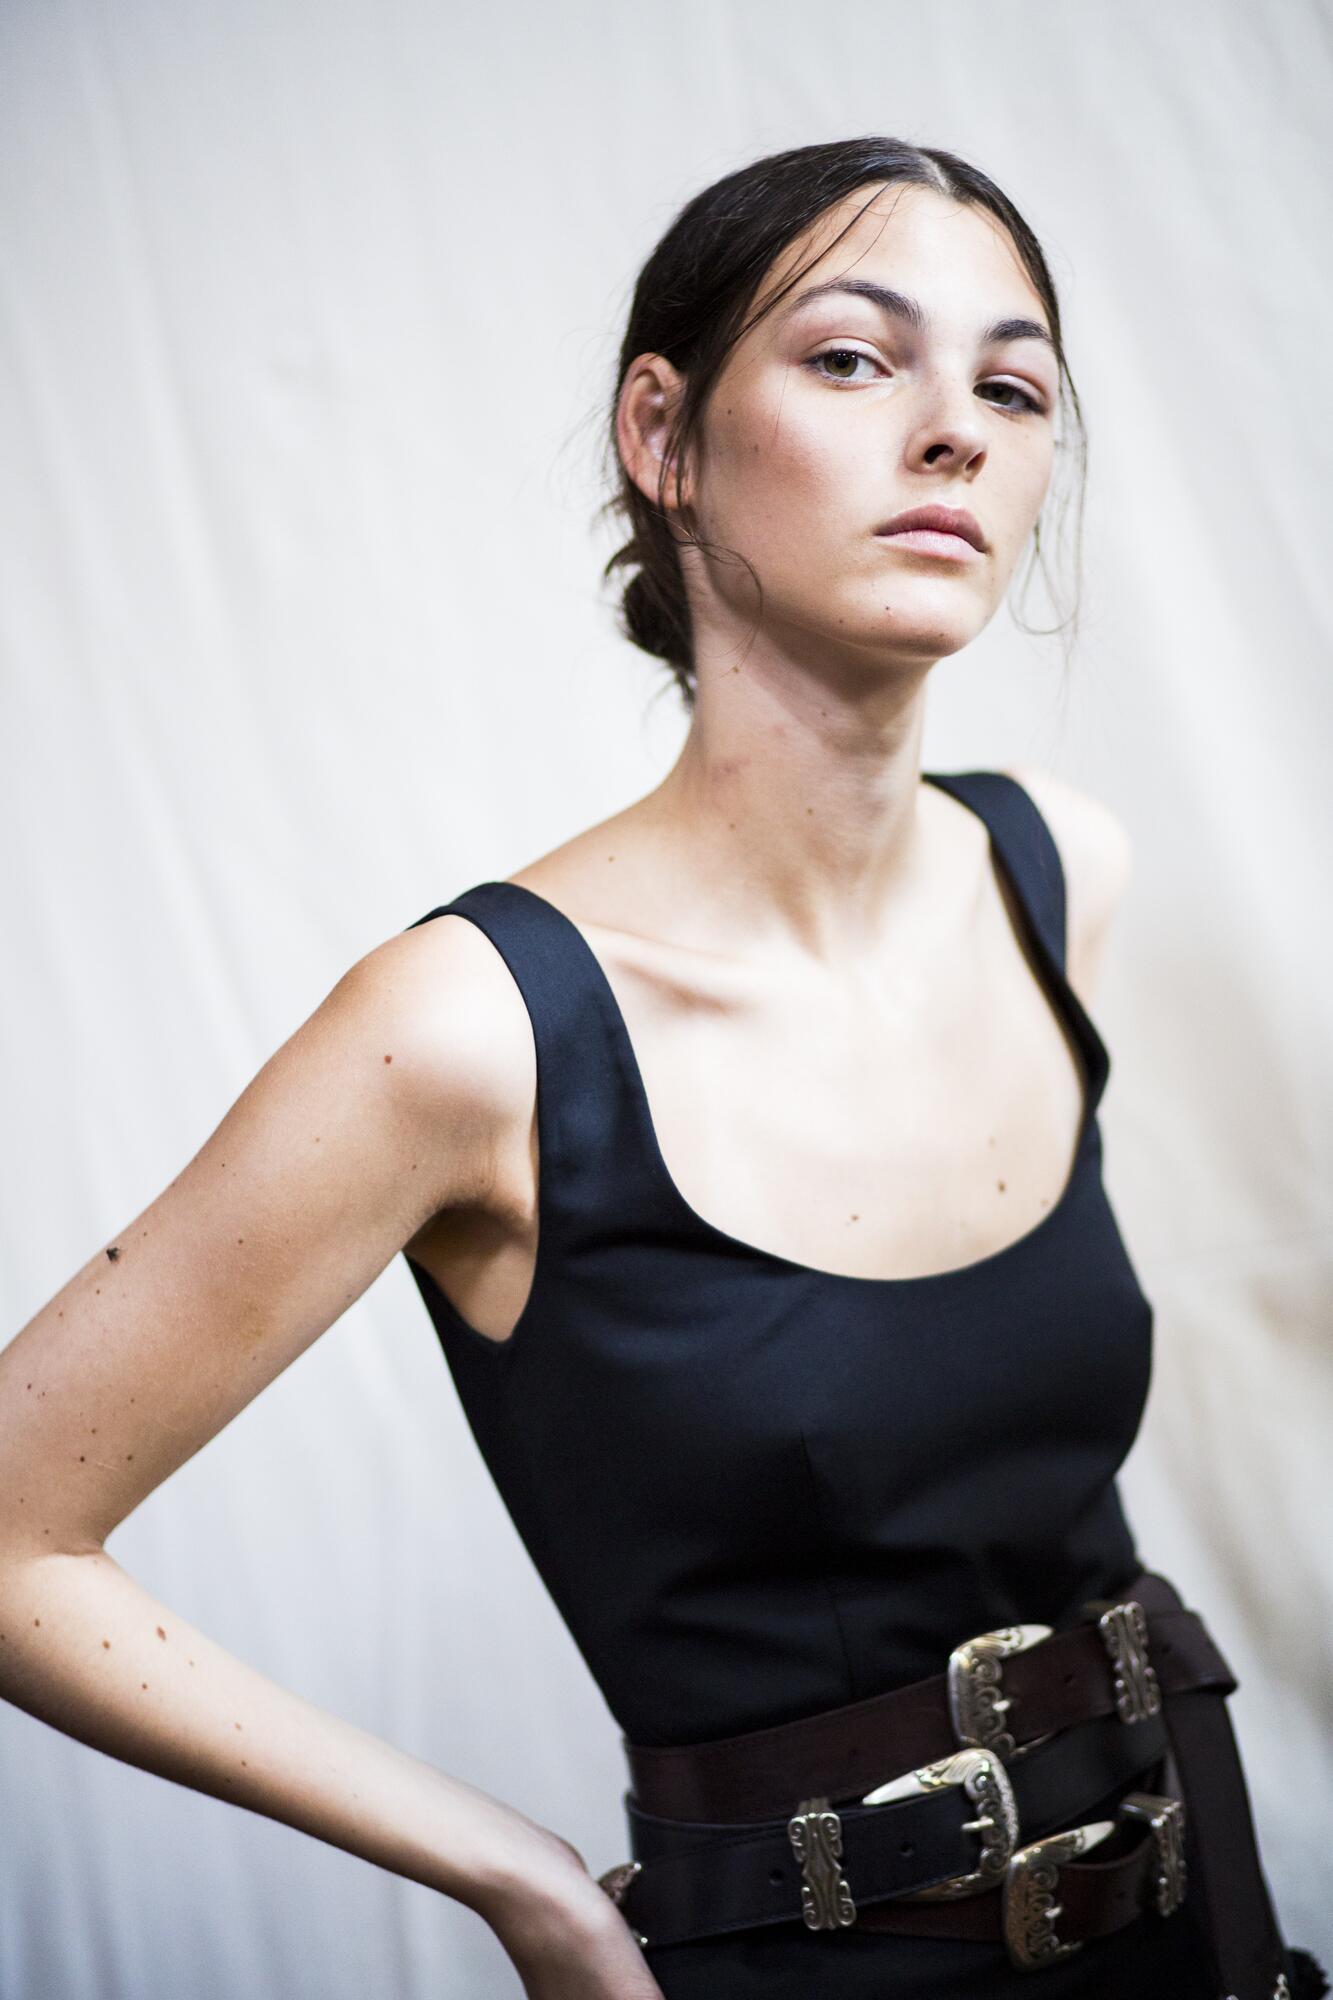 Backstage Alberta Ferretti 2017 Milan